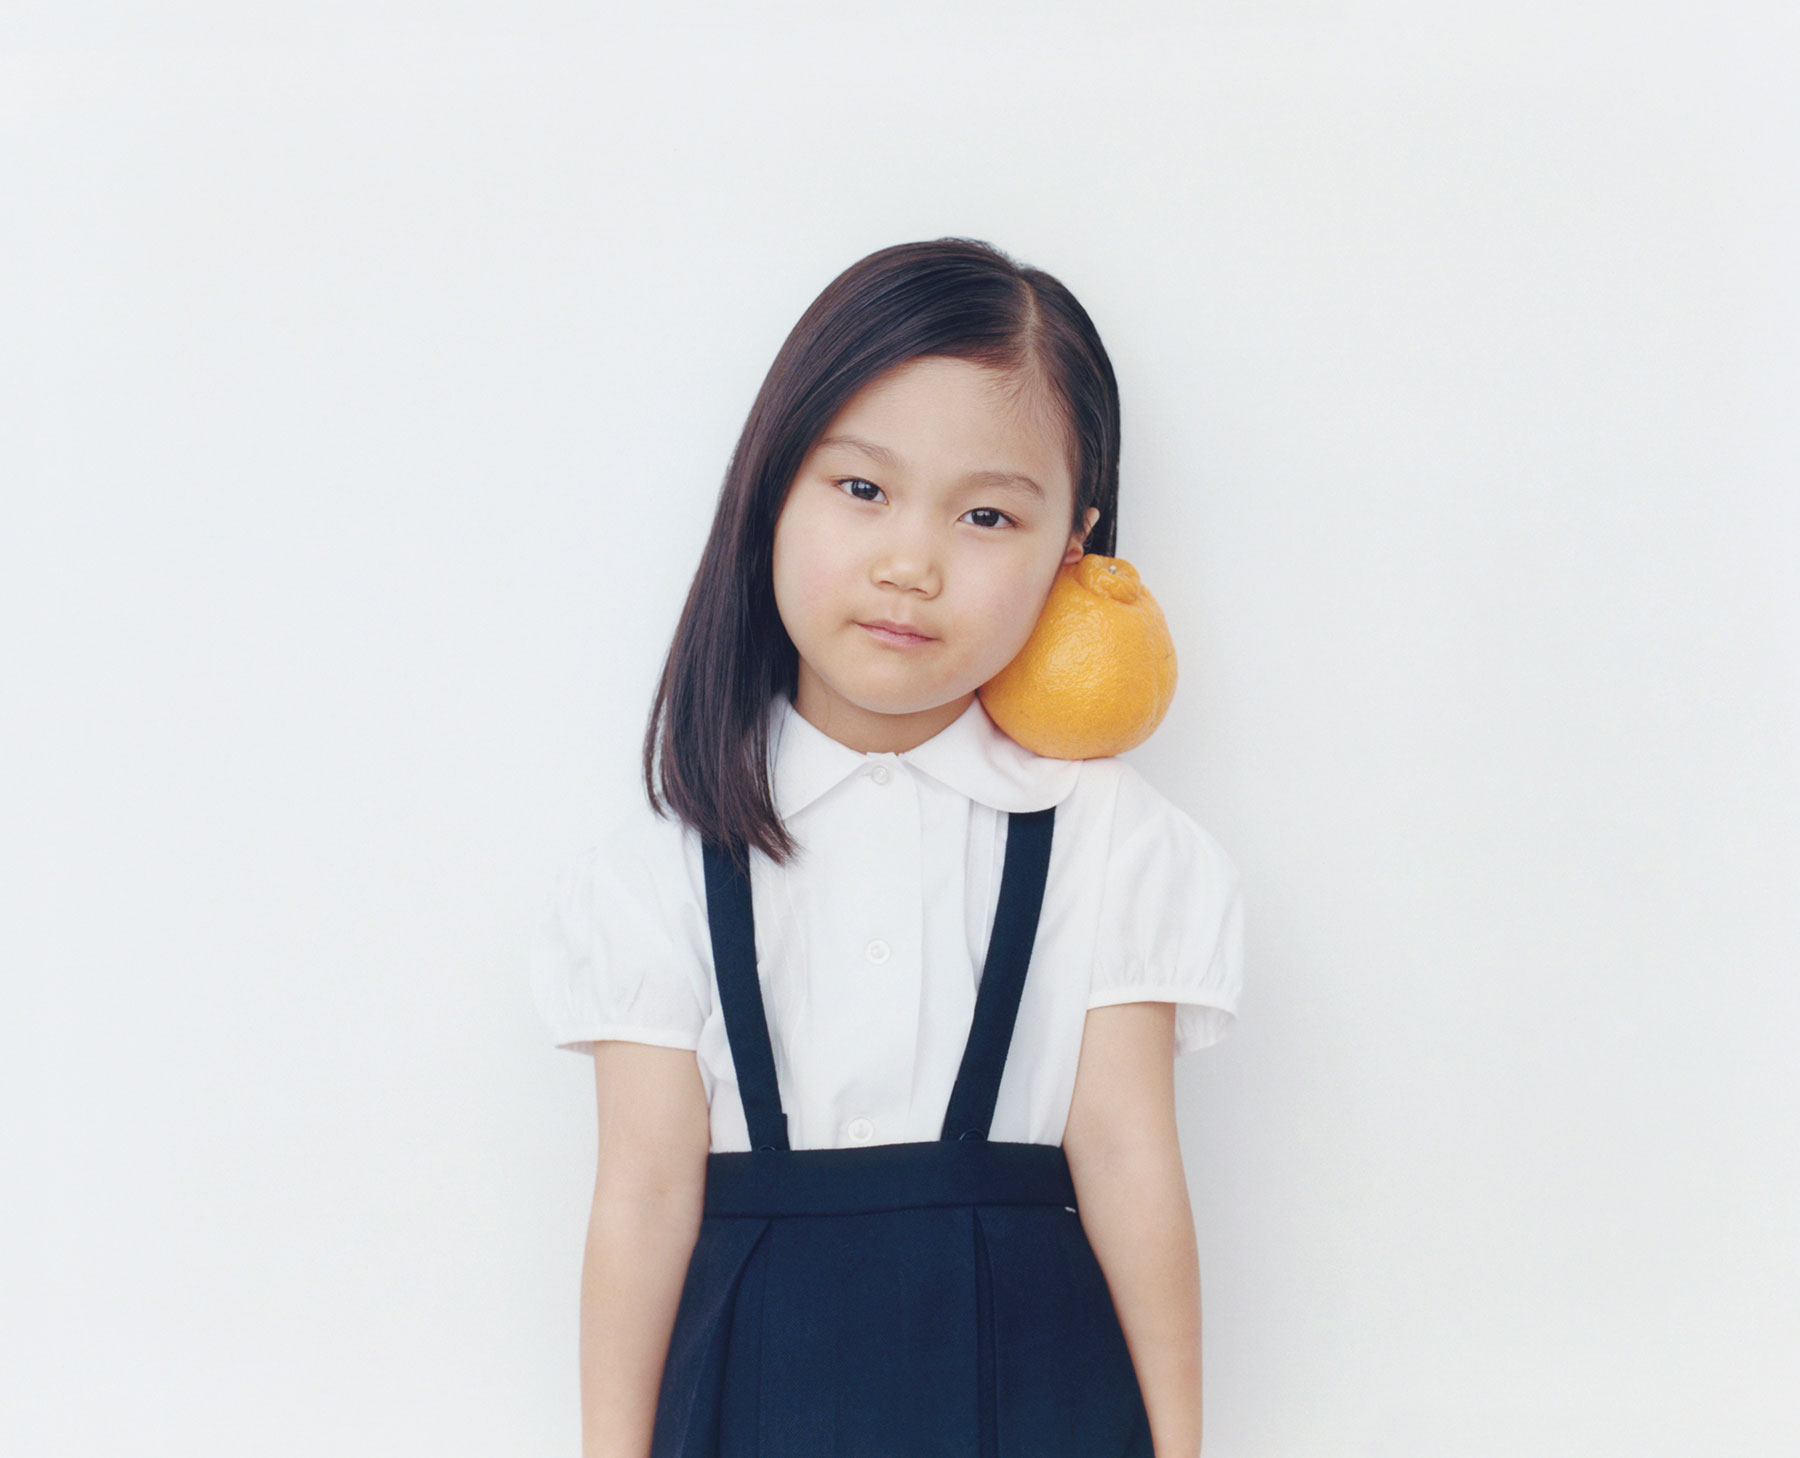 Osamu Yokonami,  1000 Children: Sumo Mandarin No. 8 , 2010-2013  Digital pigment print, 895 x 1105 mm (approx. 34.25 x 43.5 in), edition of 5; 146 x 168 mm (approx. 5.75 x 6.6 in), edition of 10   Inquire